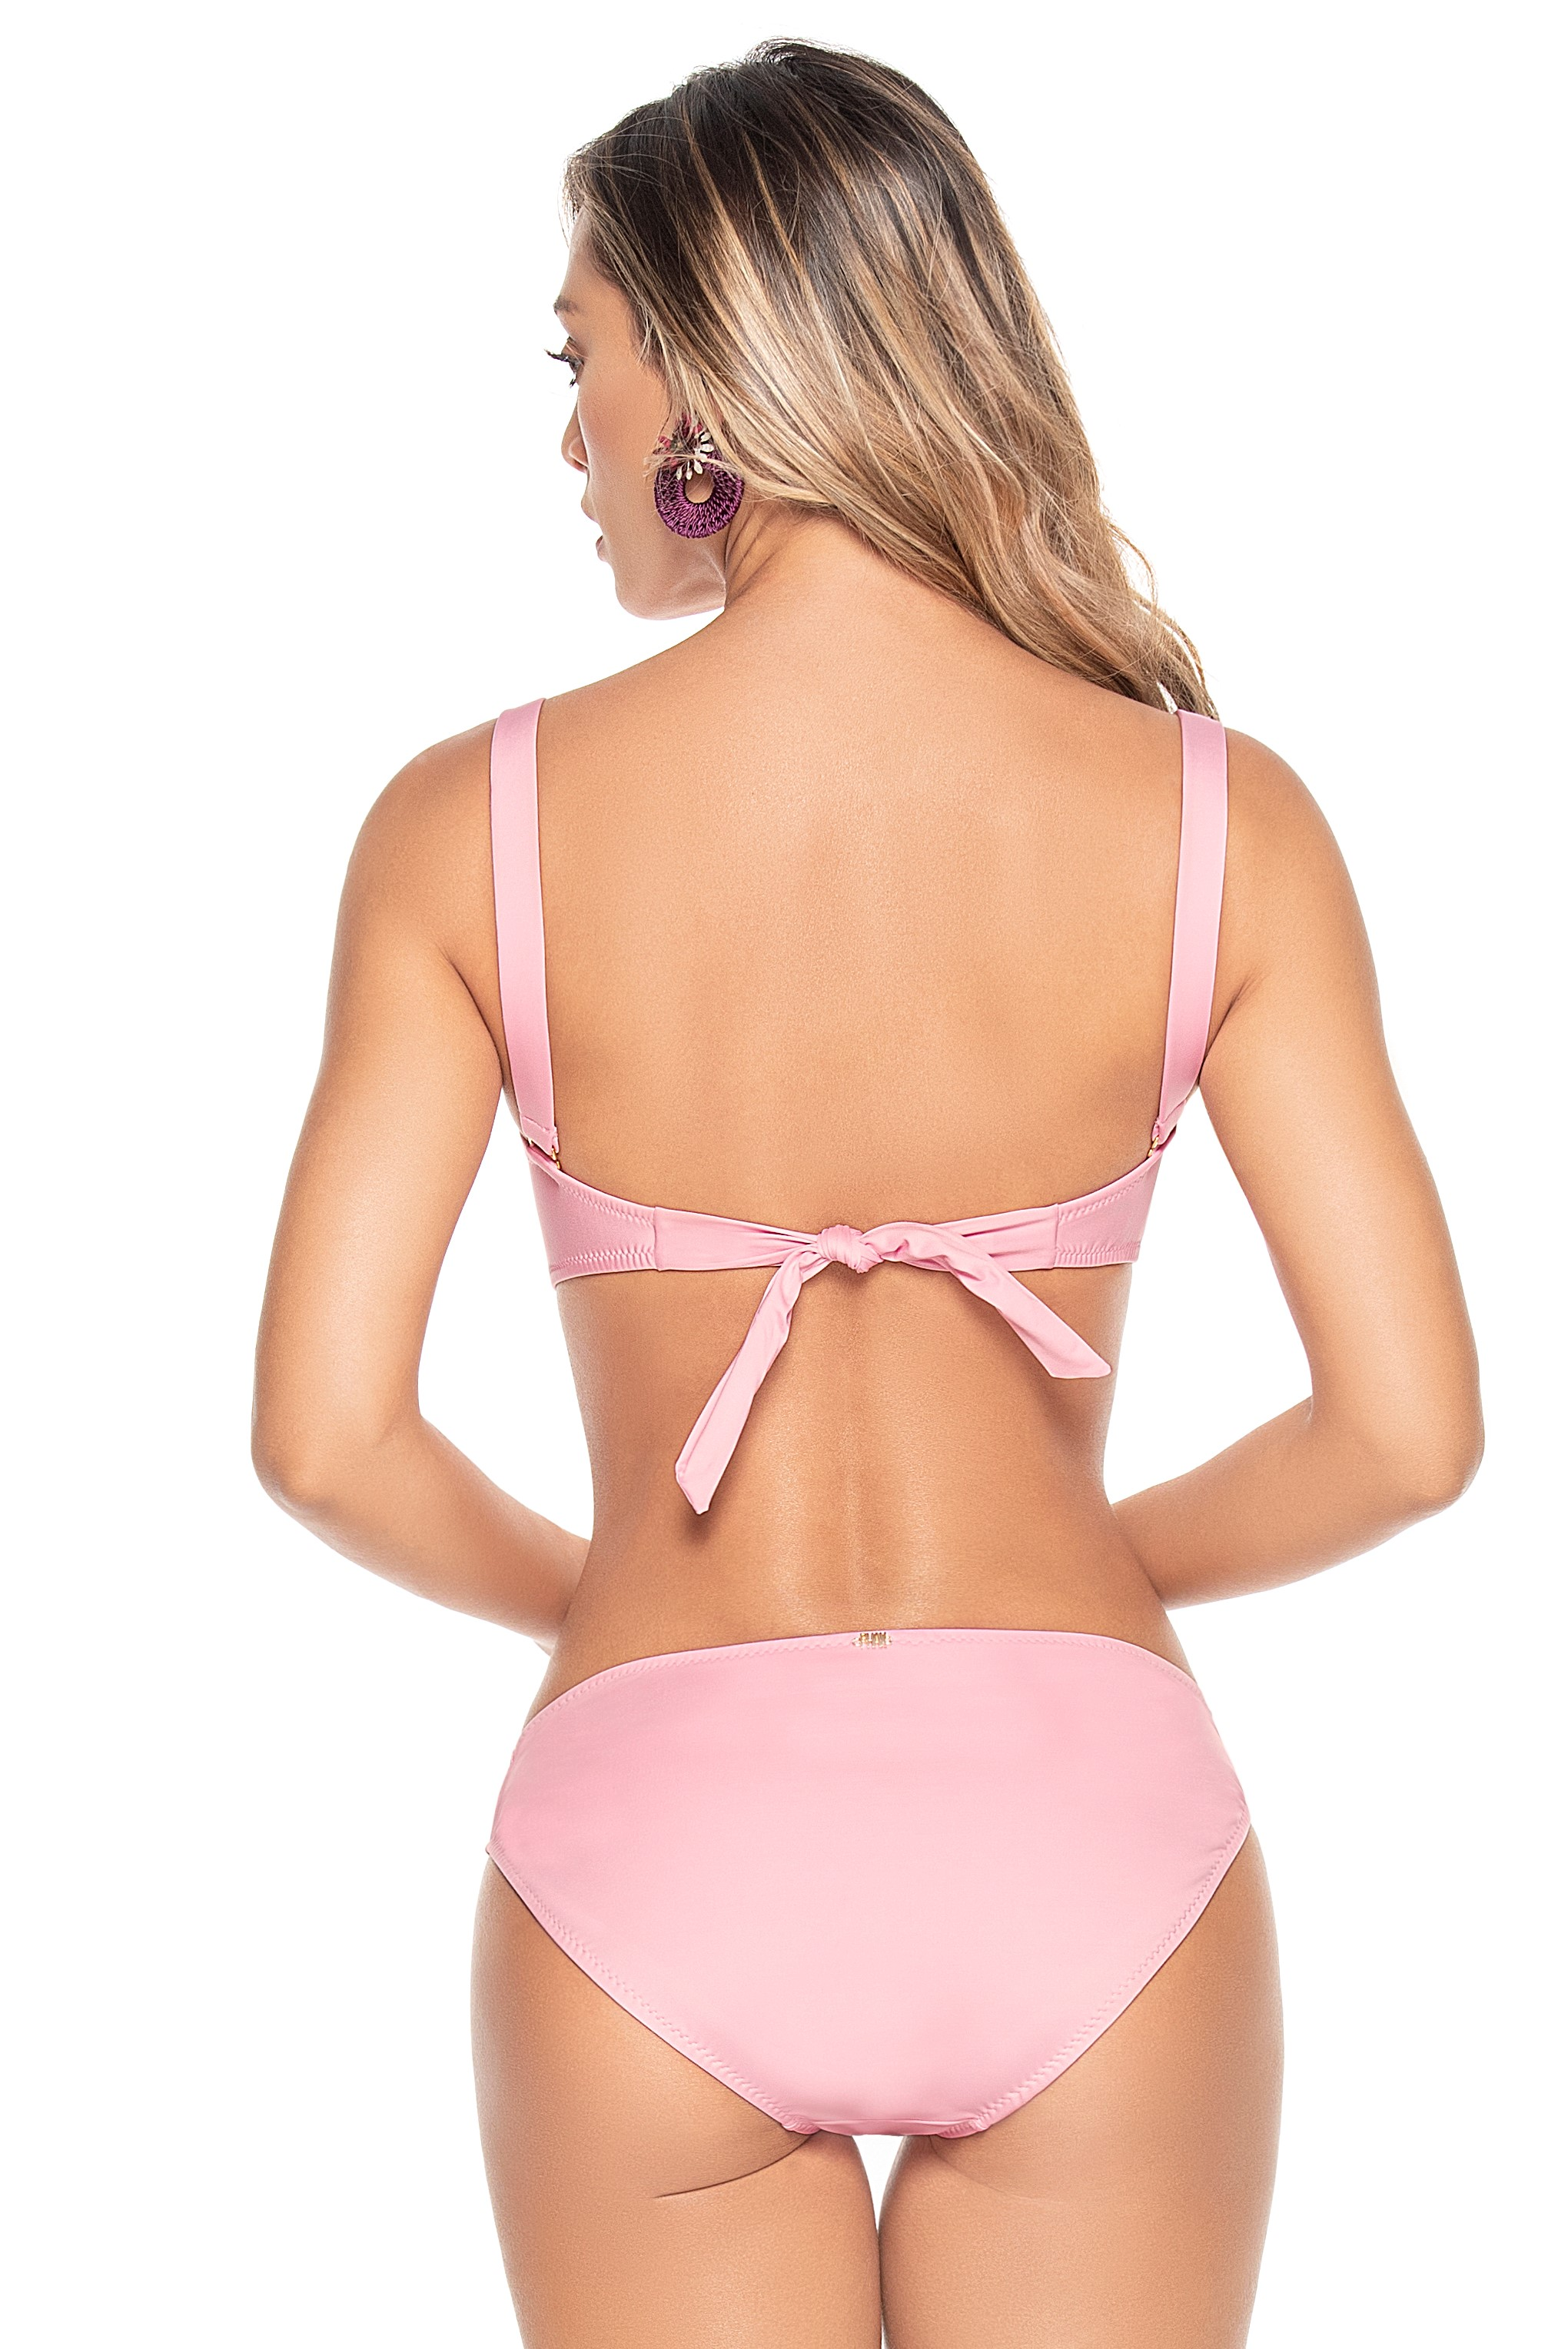 Phax Light Pink Strapless Wire Bikini